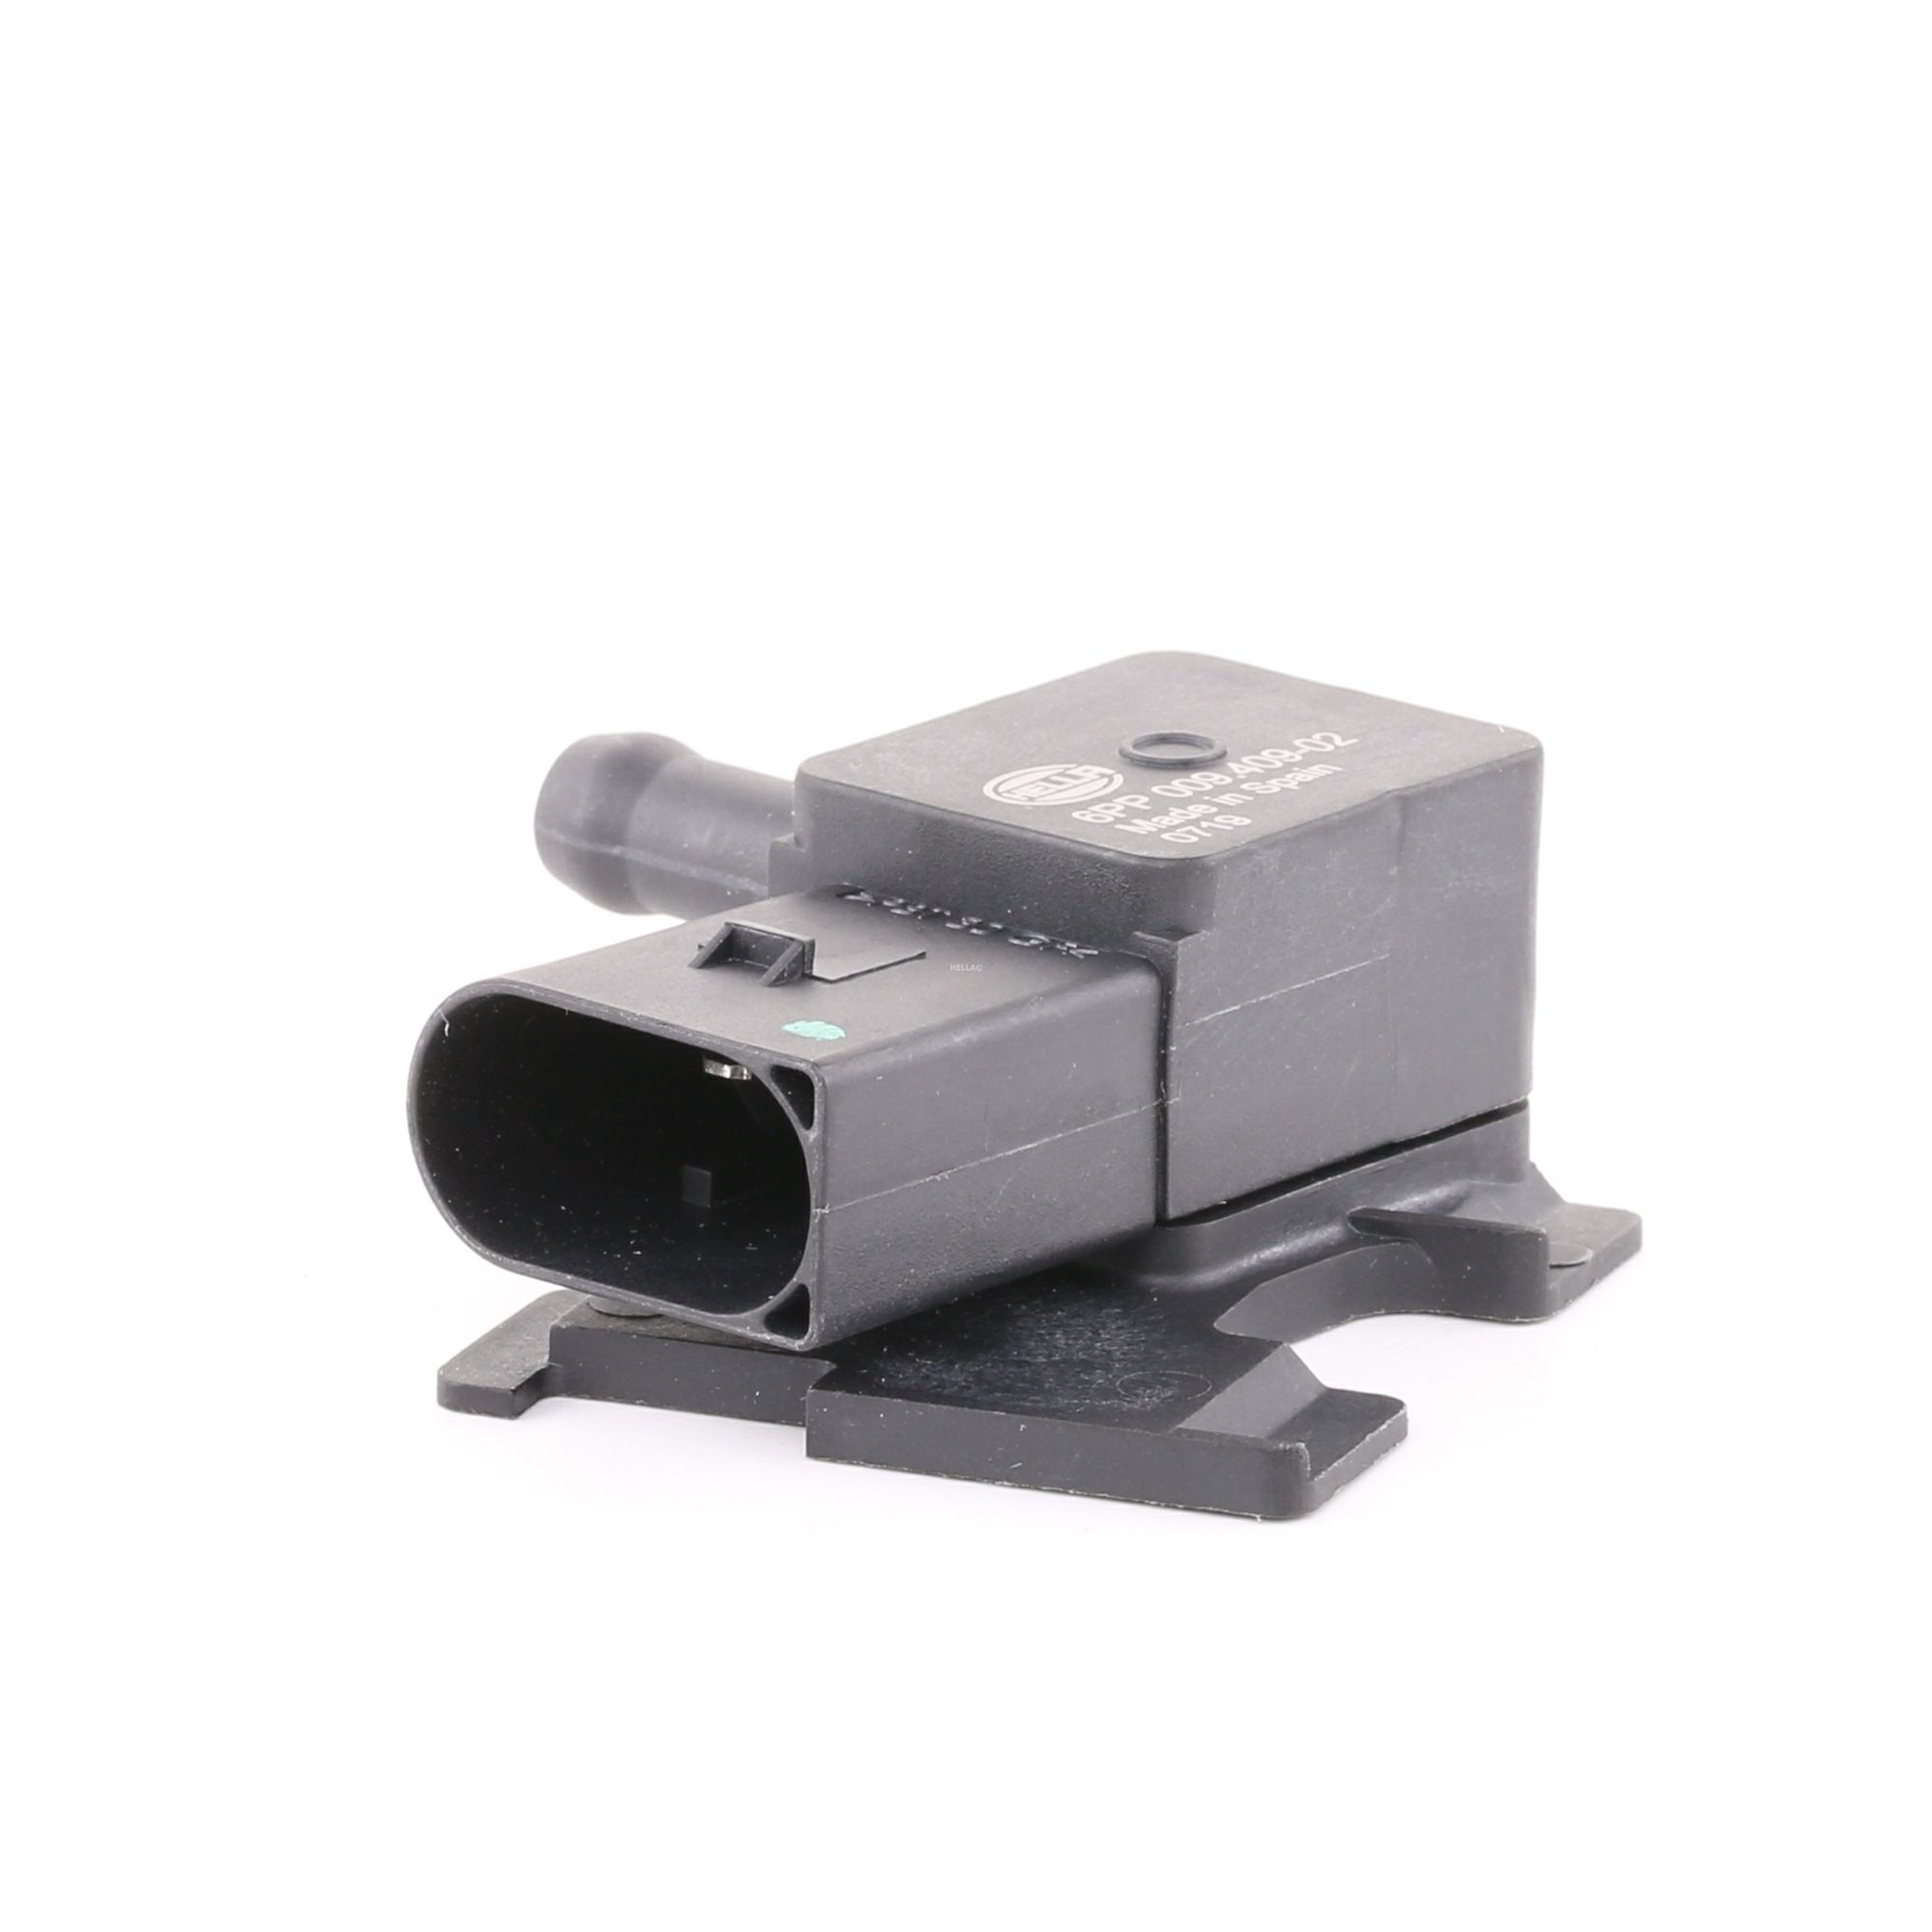 Abgasdrucksensor HELLA 6PP 009 409-021